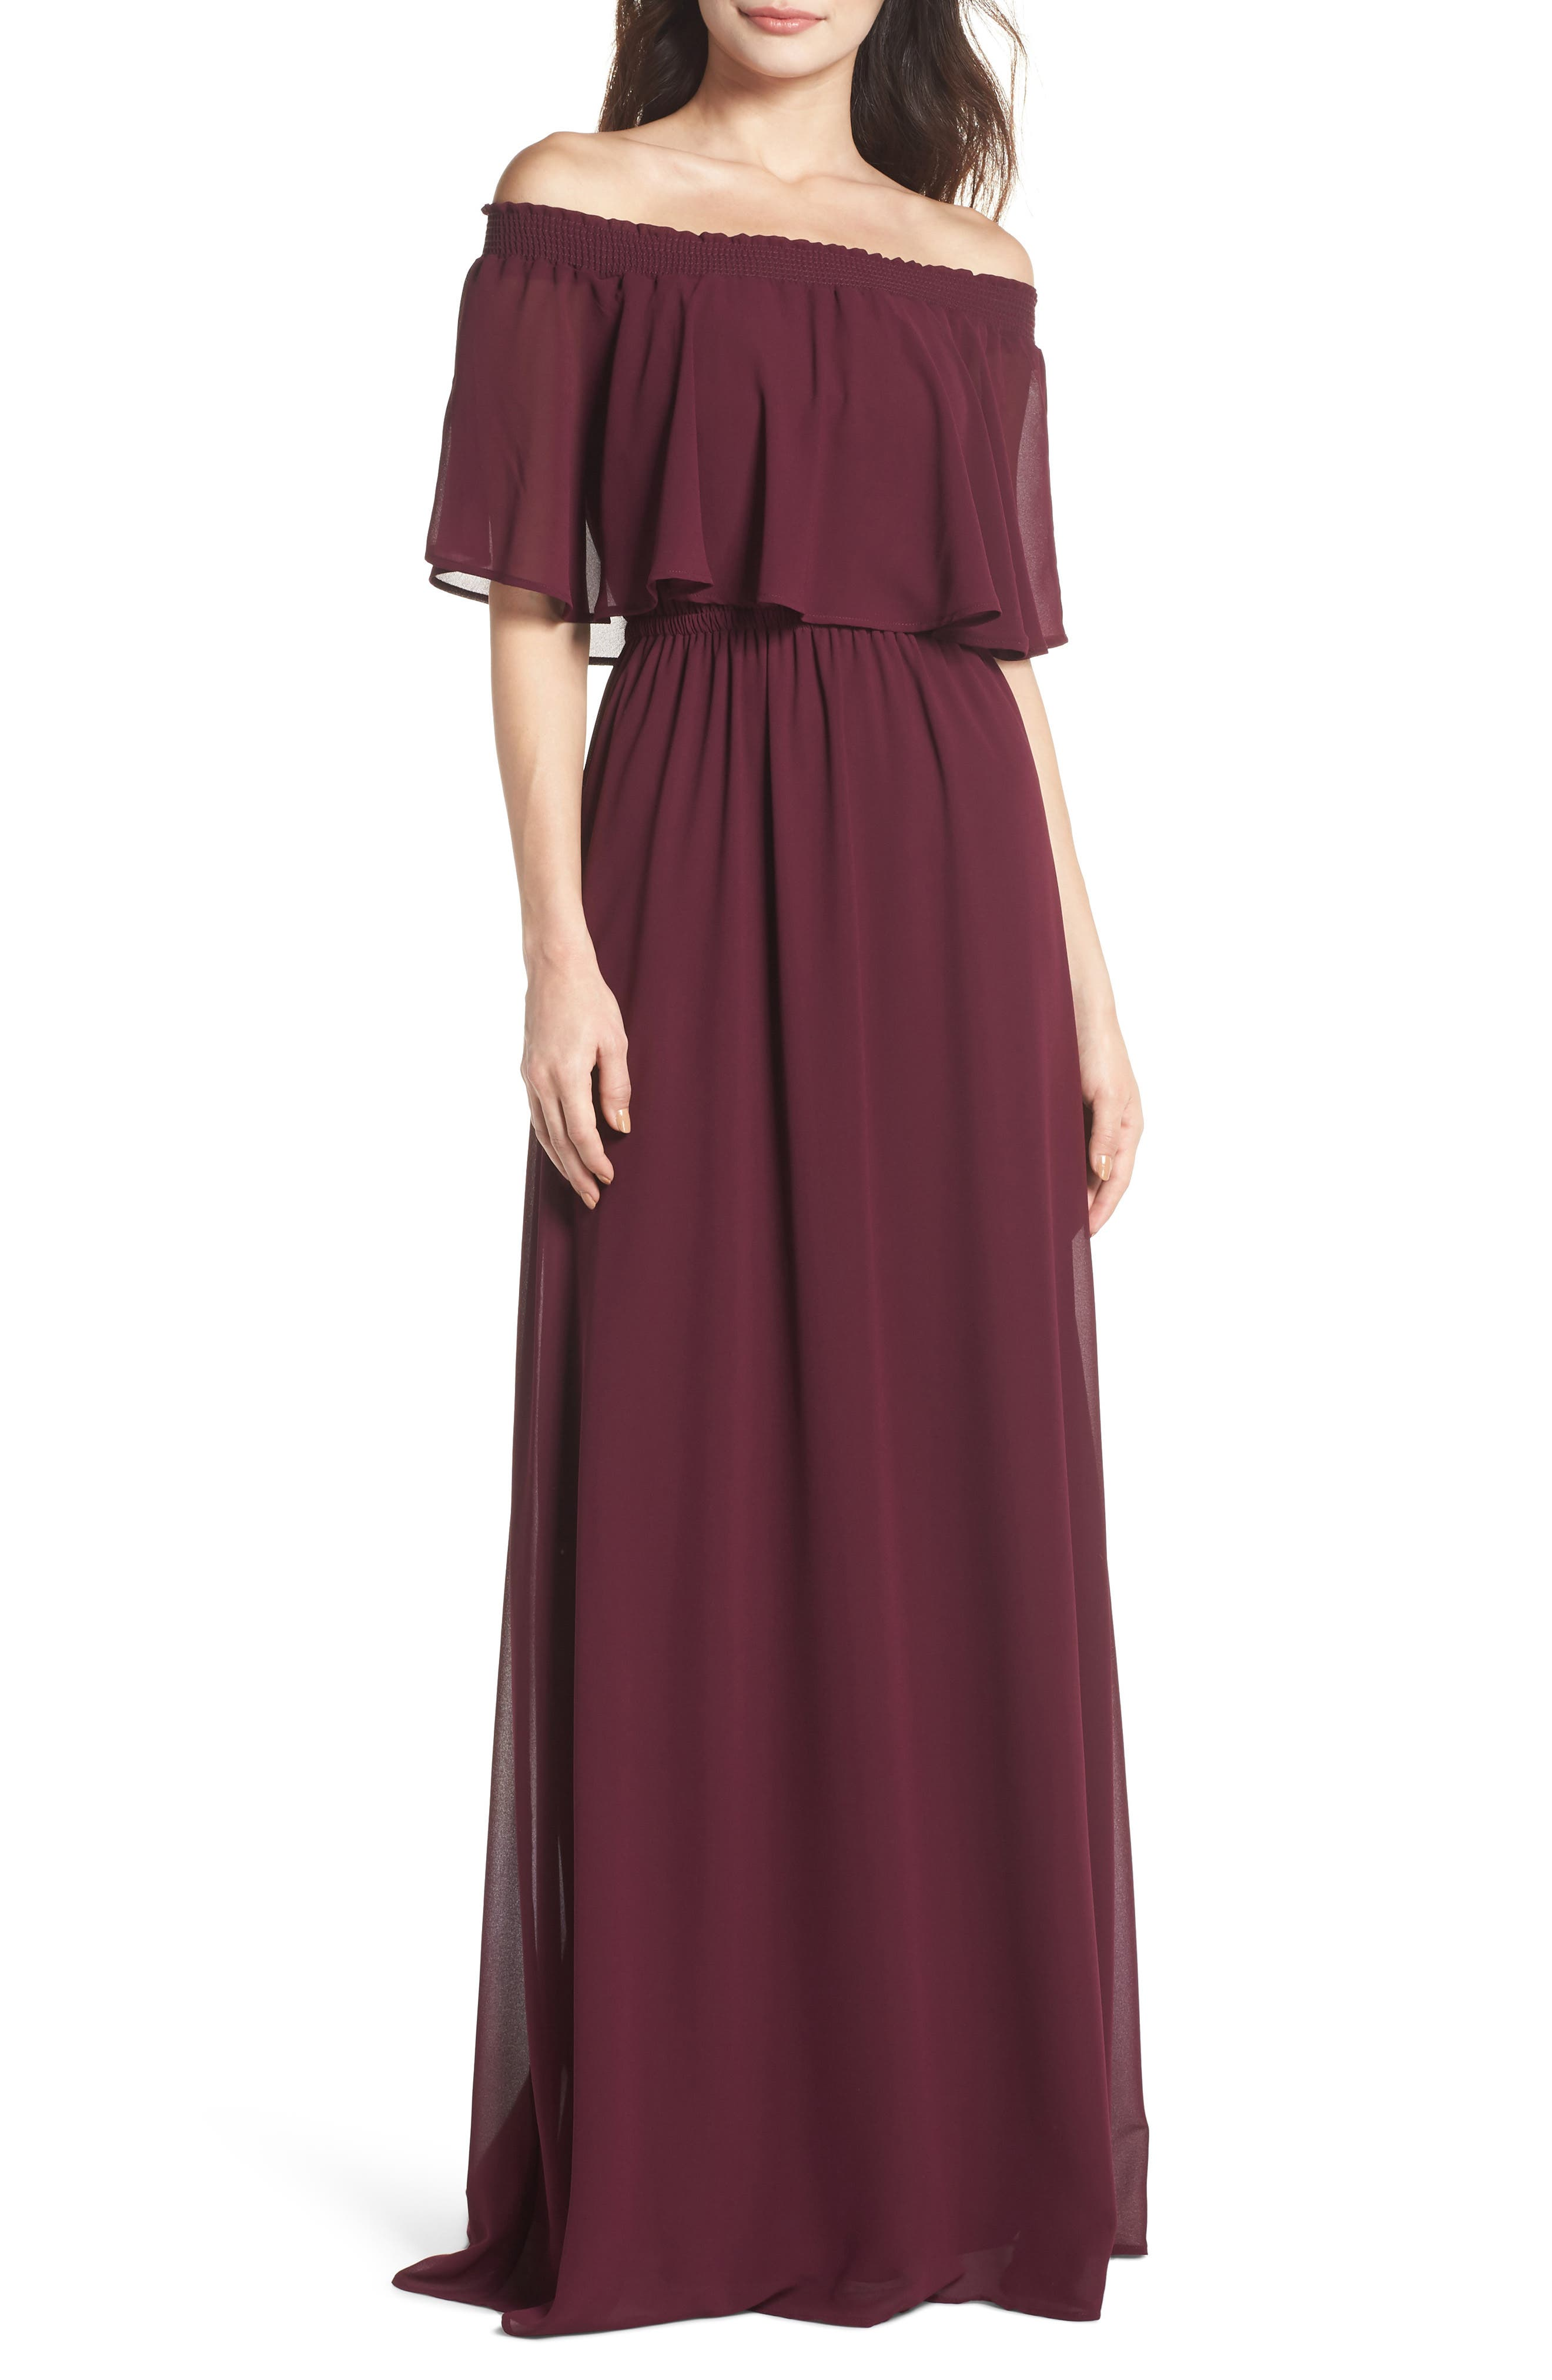 Hacienda Convertible Gown,                         Main,                         color, MERLOT CHIFFON